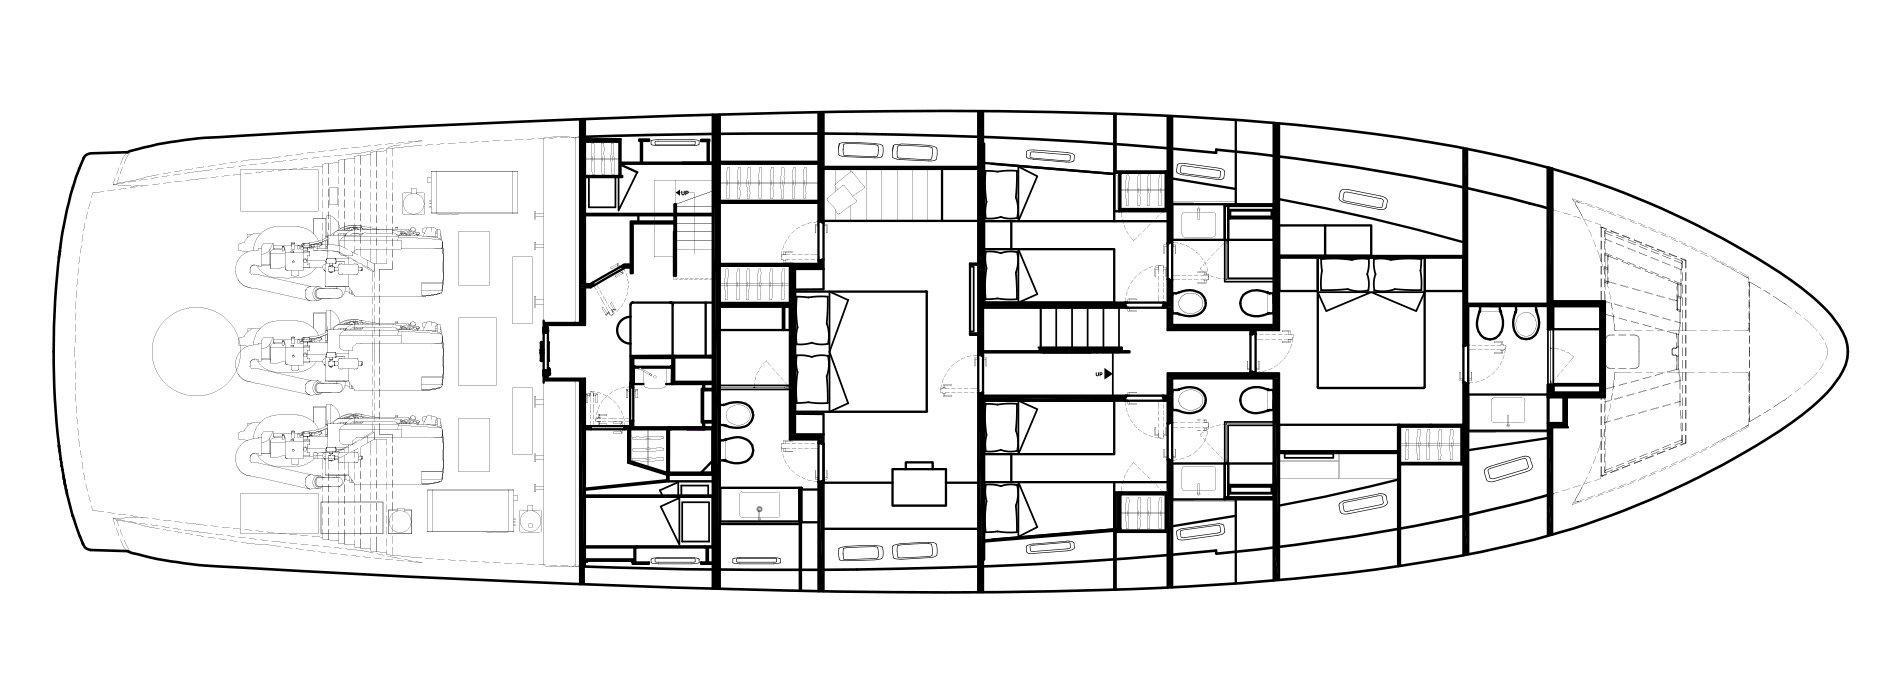 Sanlorenzo Yachts SX88 Нижняя палуба версия A